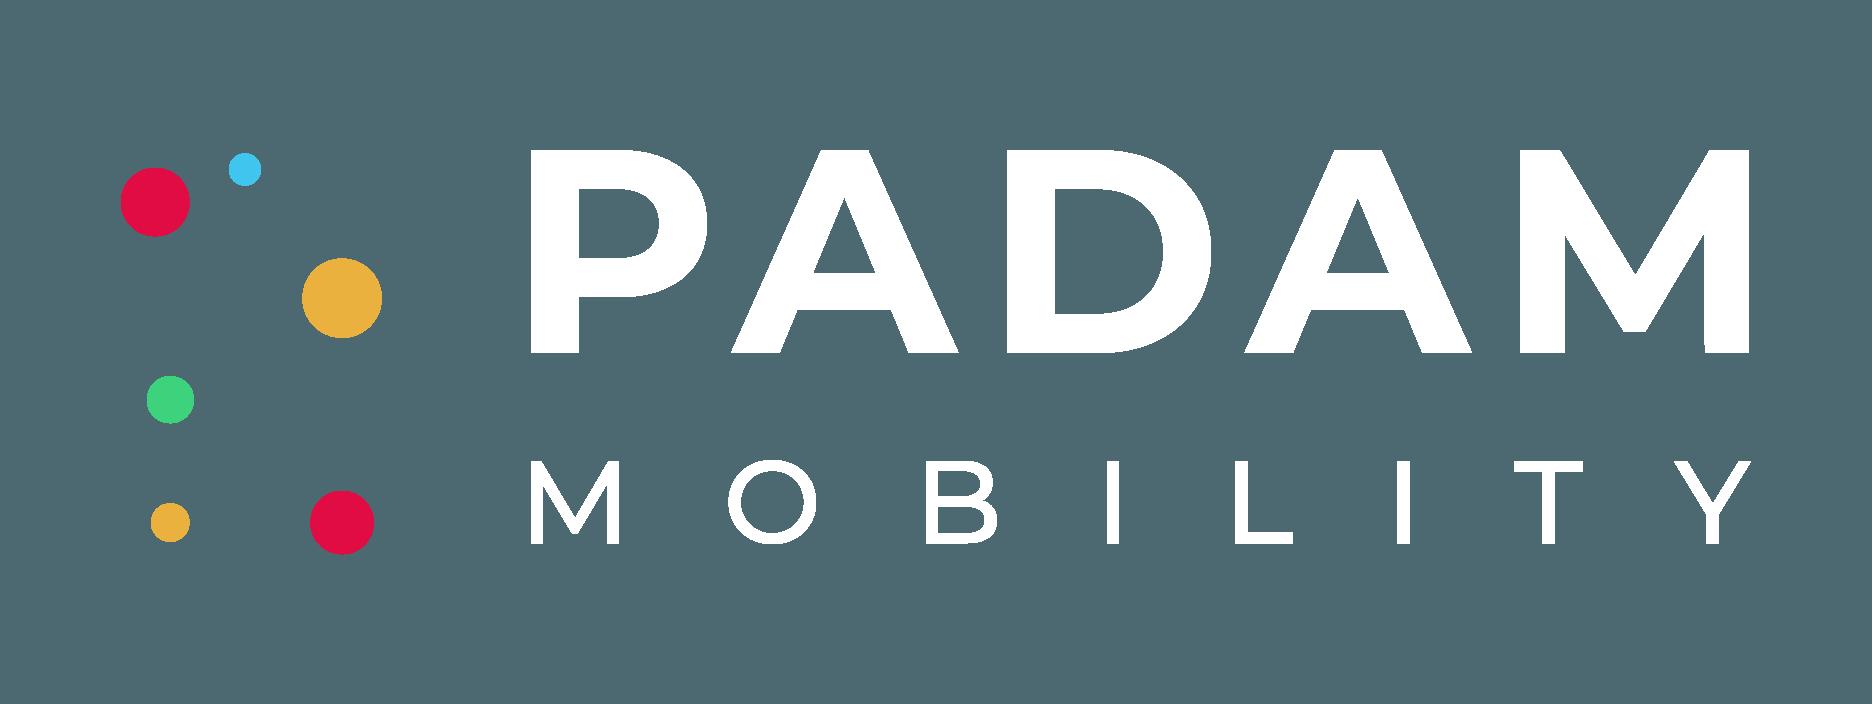 Padam Blog